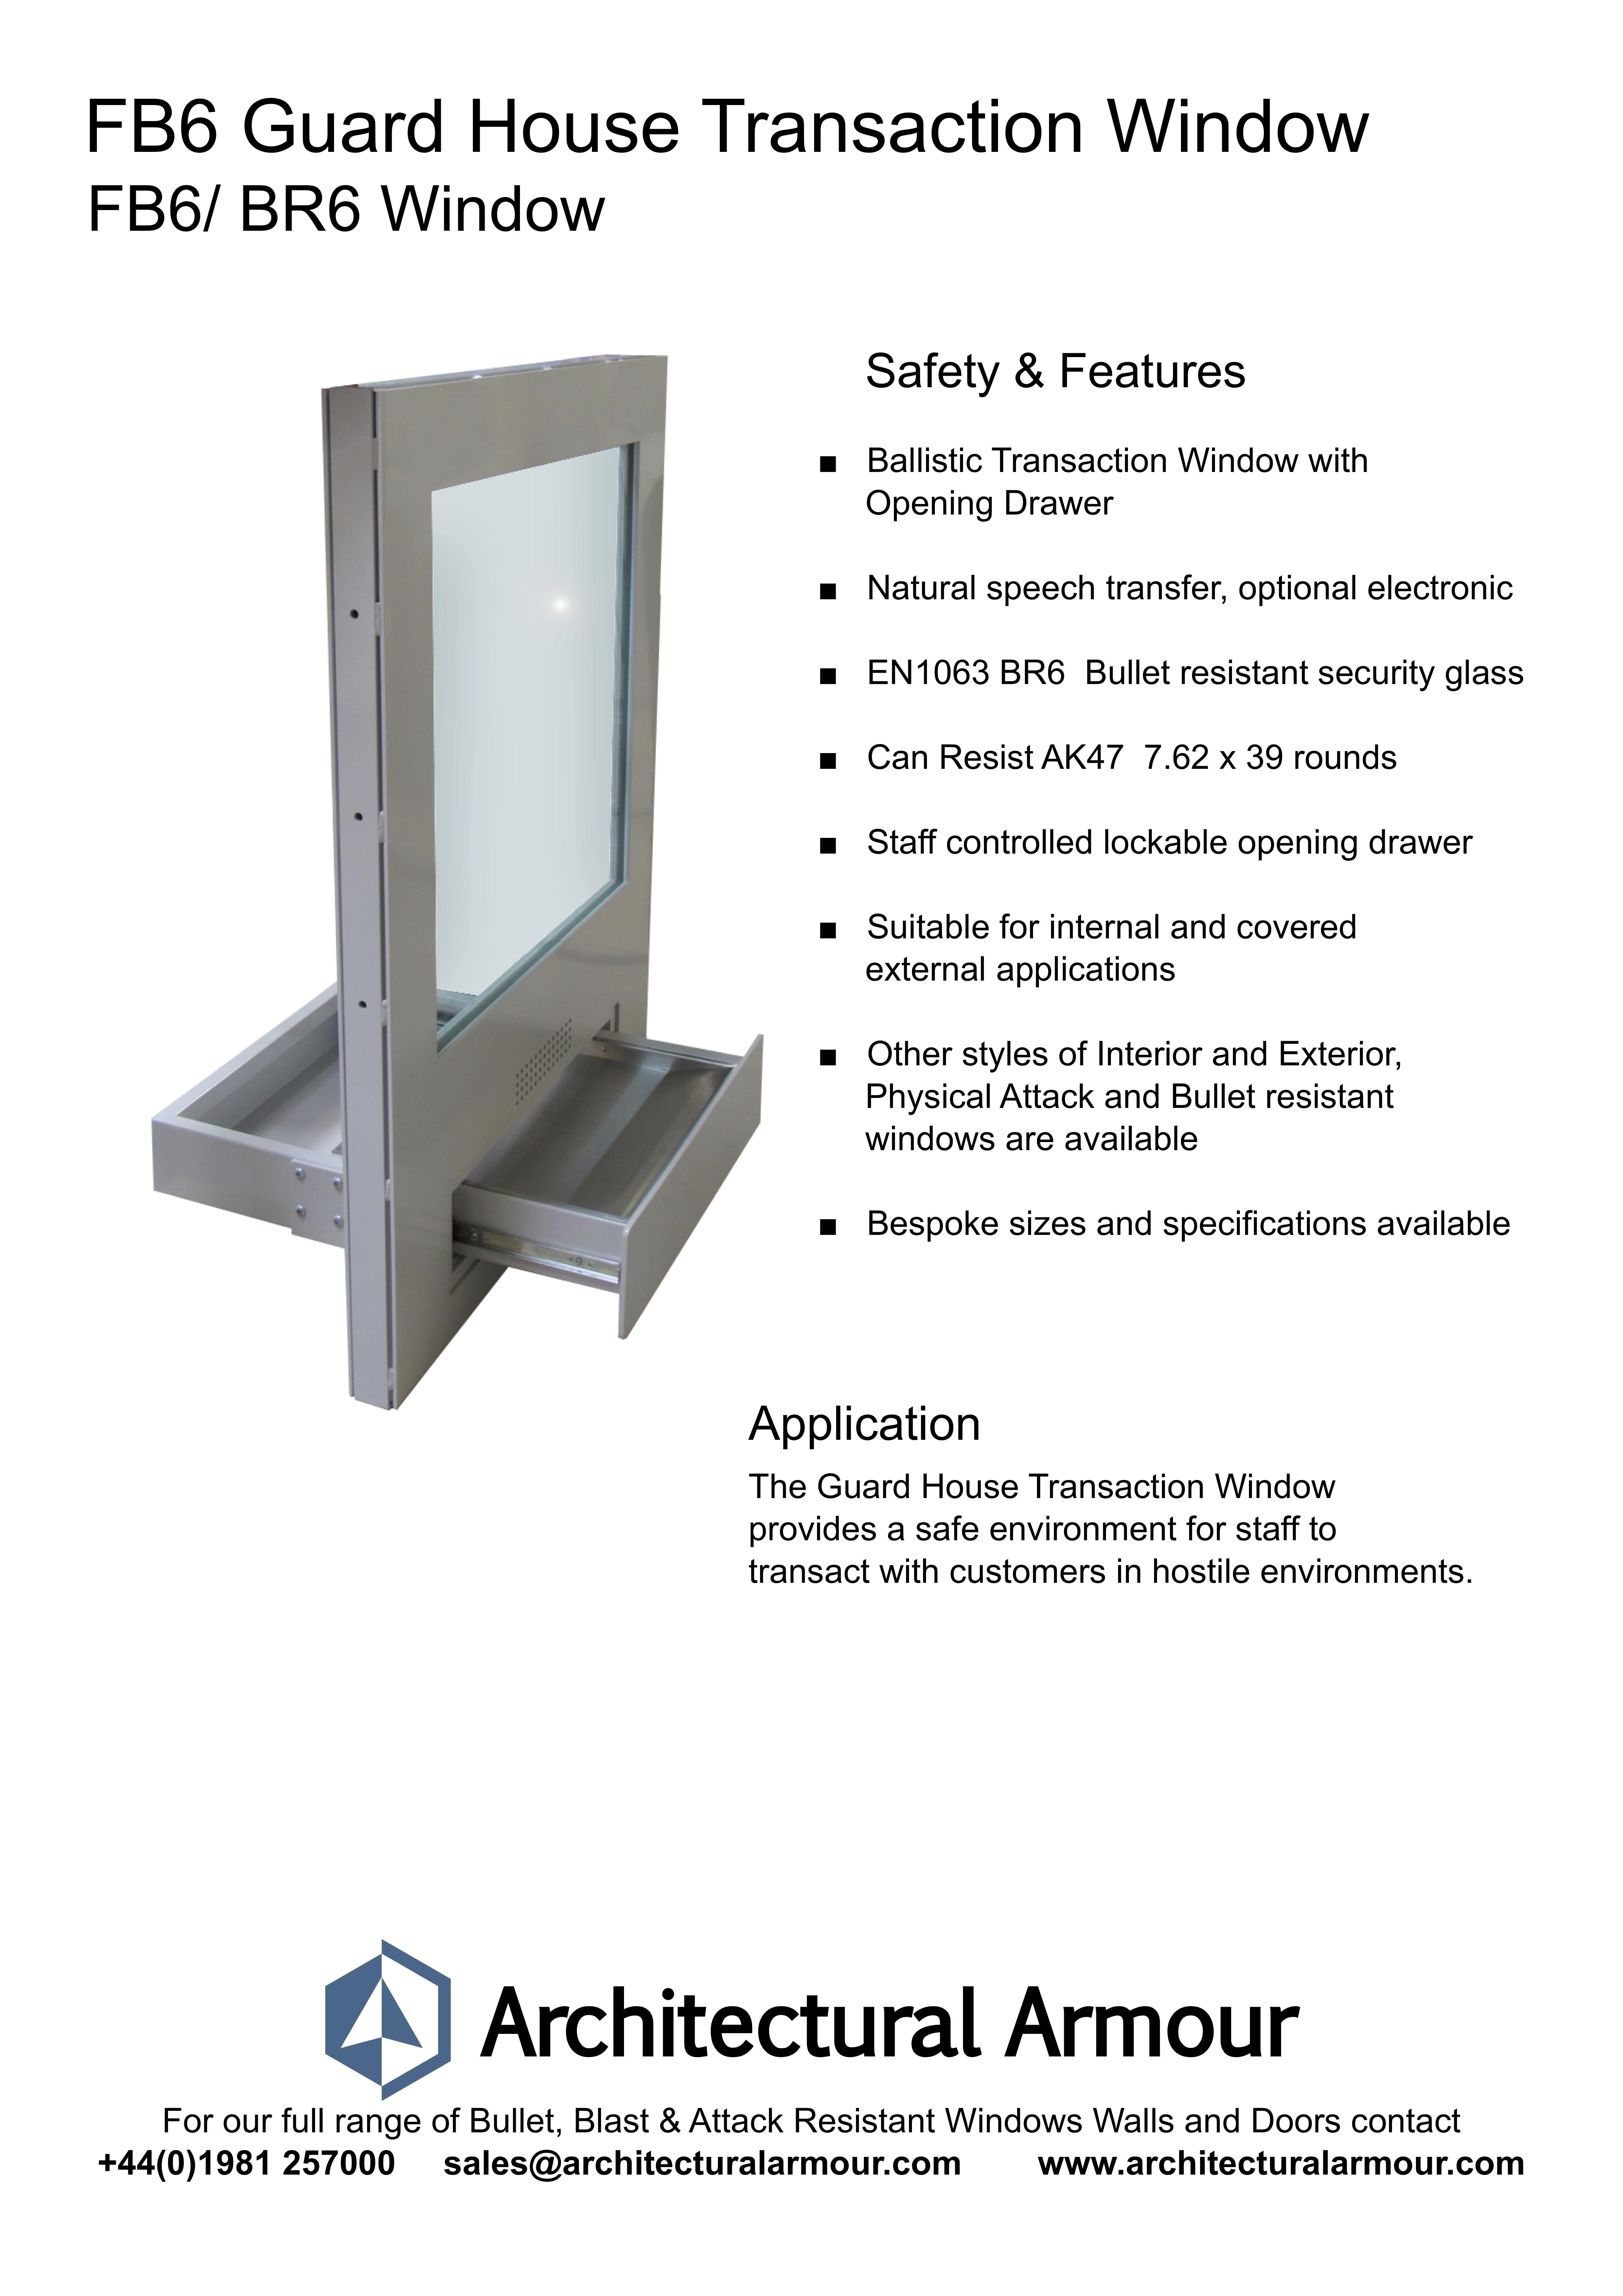 FB6 BR6 guard house transaction window